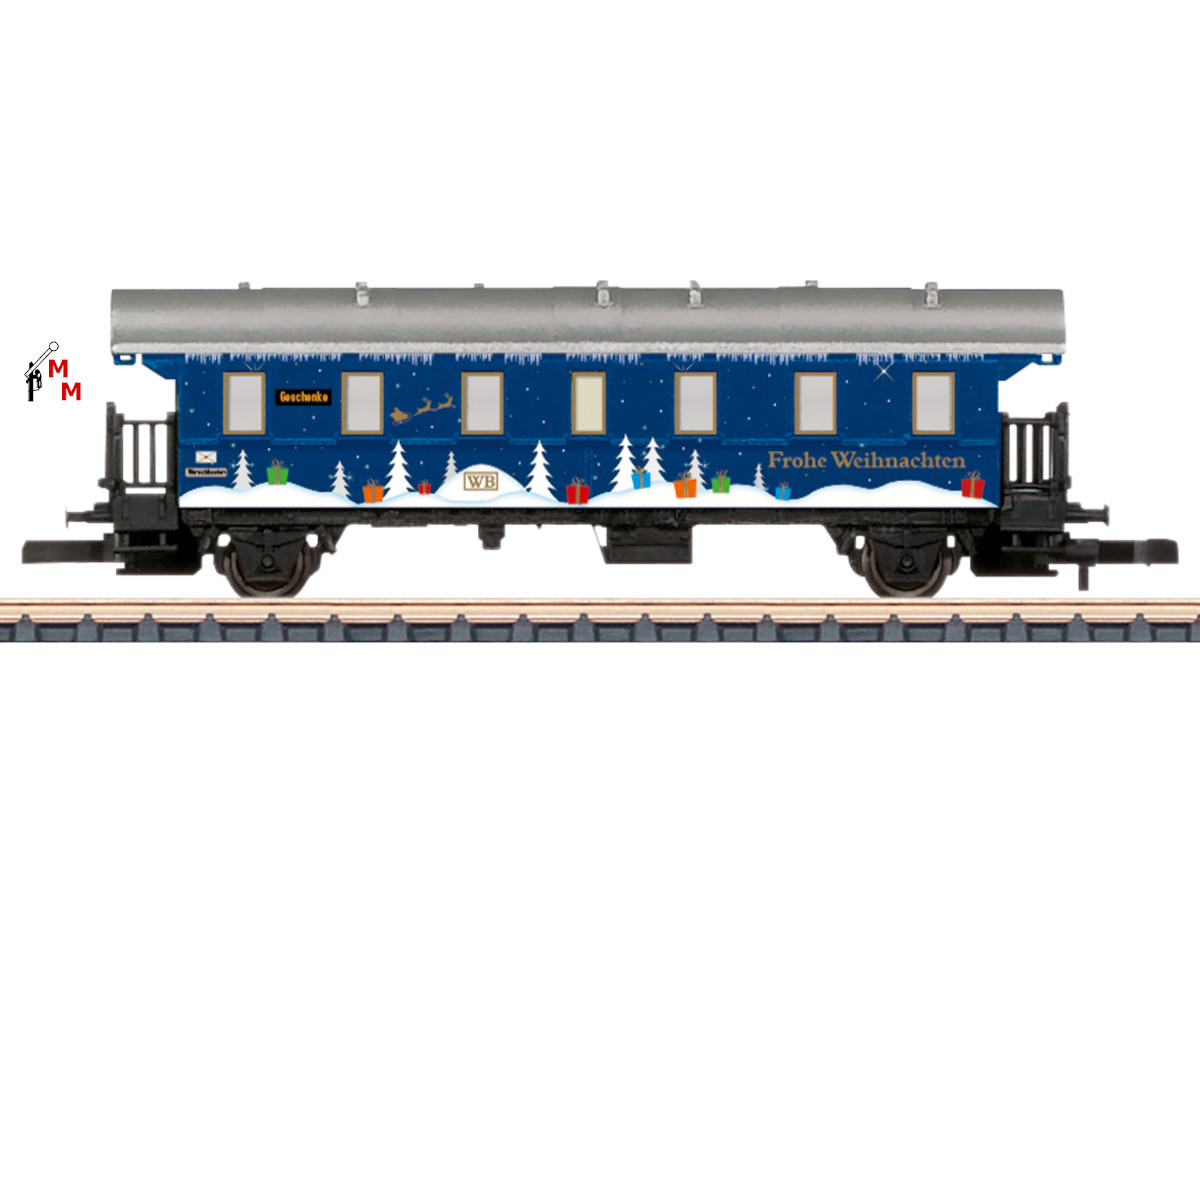 (Neu) Märklin 80631 Spur Z Weihnachtswagen 2021,